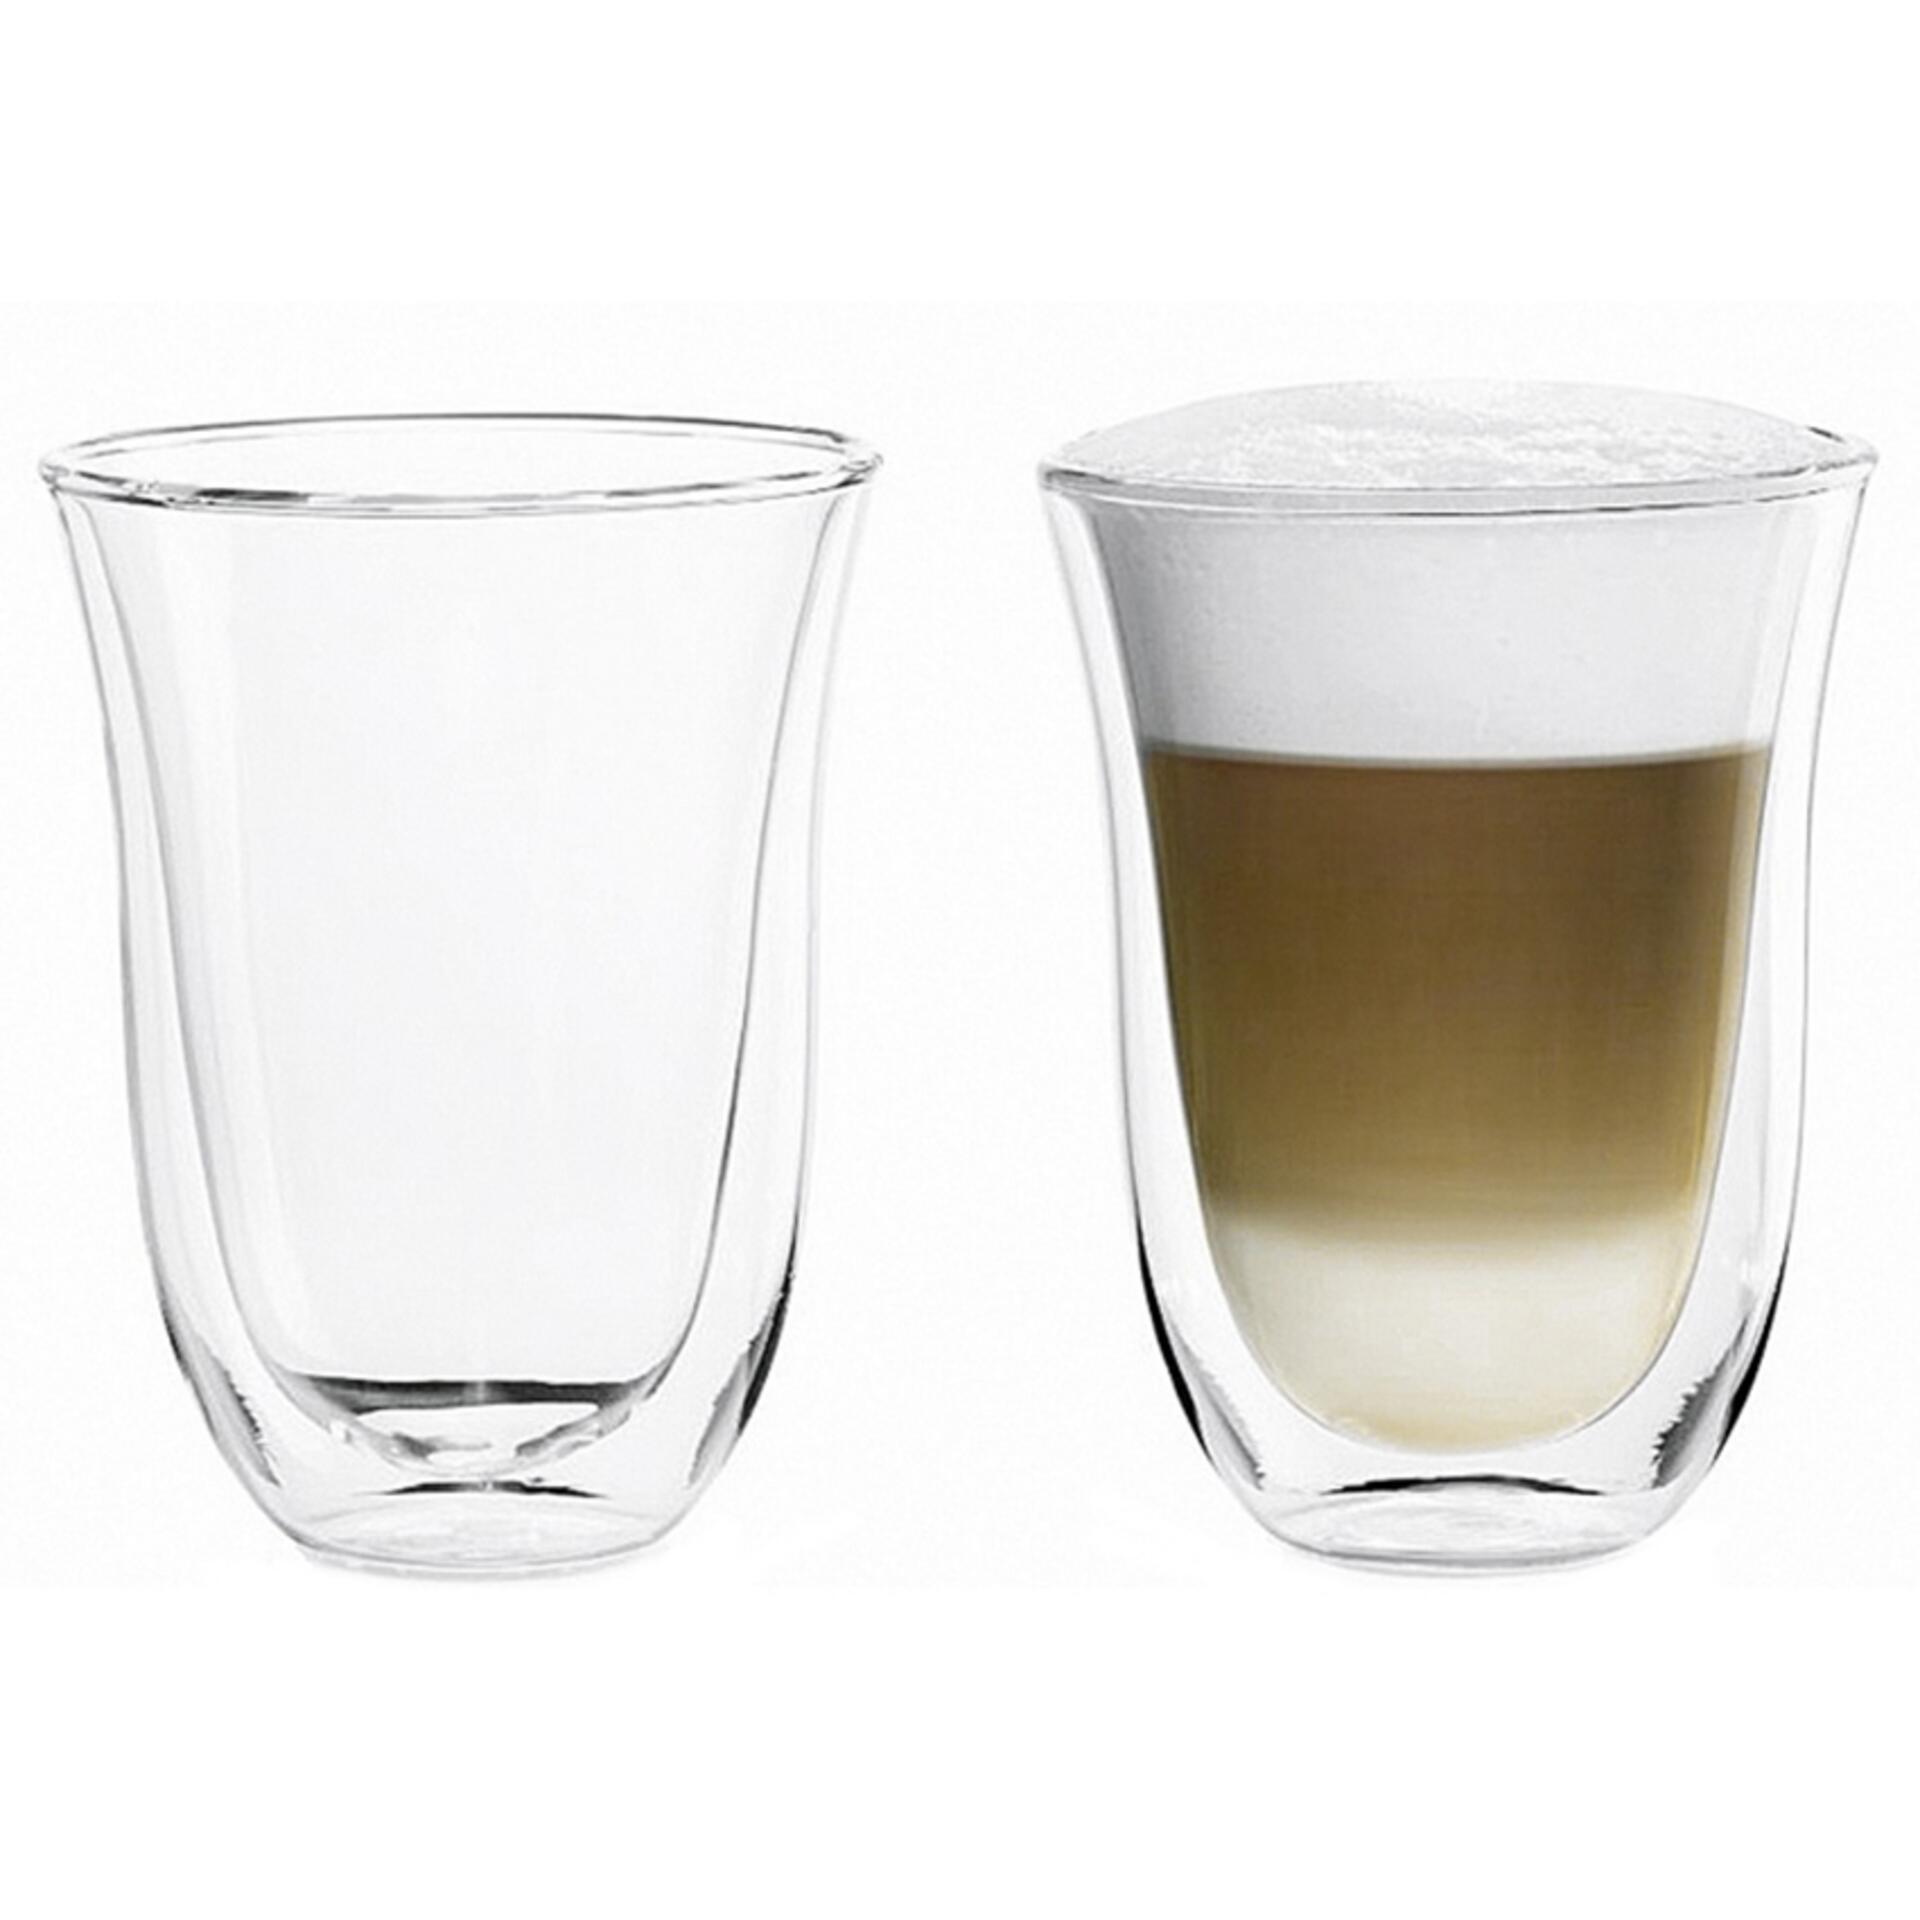 De'Longhi Latte Macchiato Gläser 2er-Set